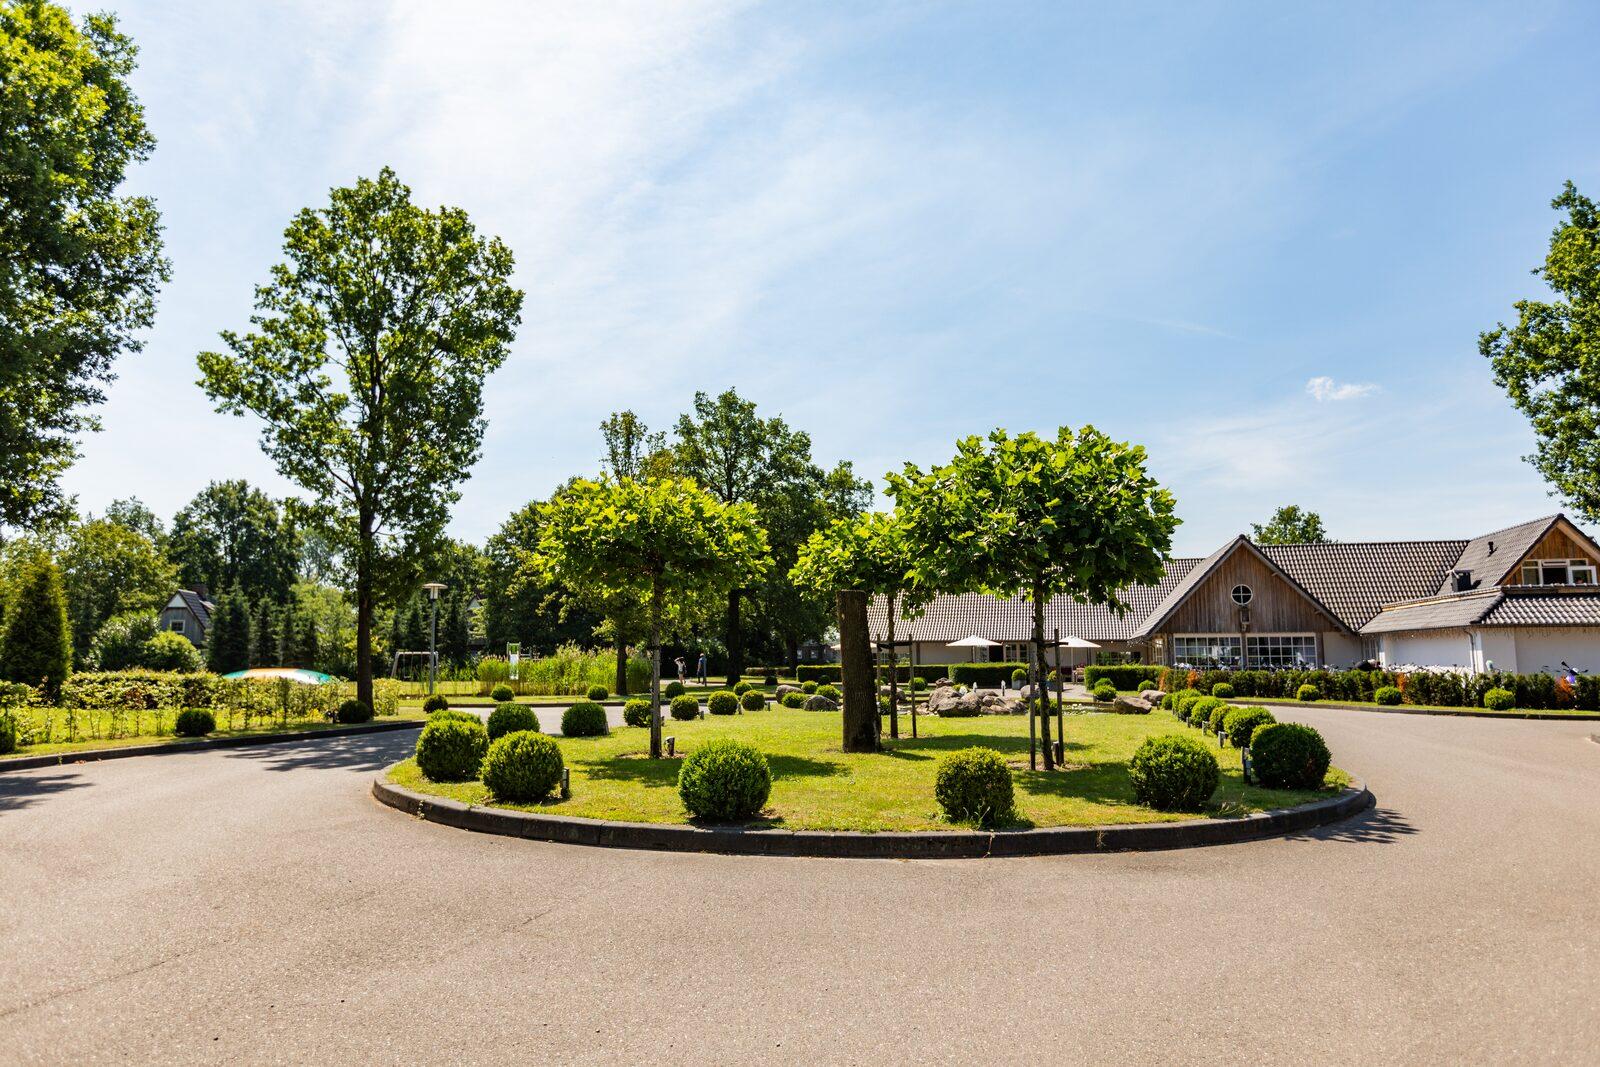 Villapark Hof van Salland